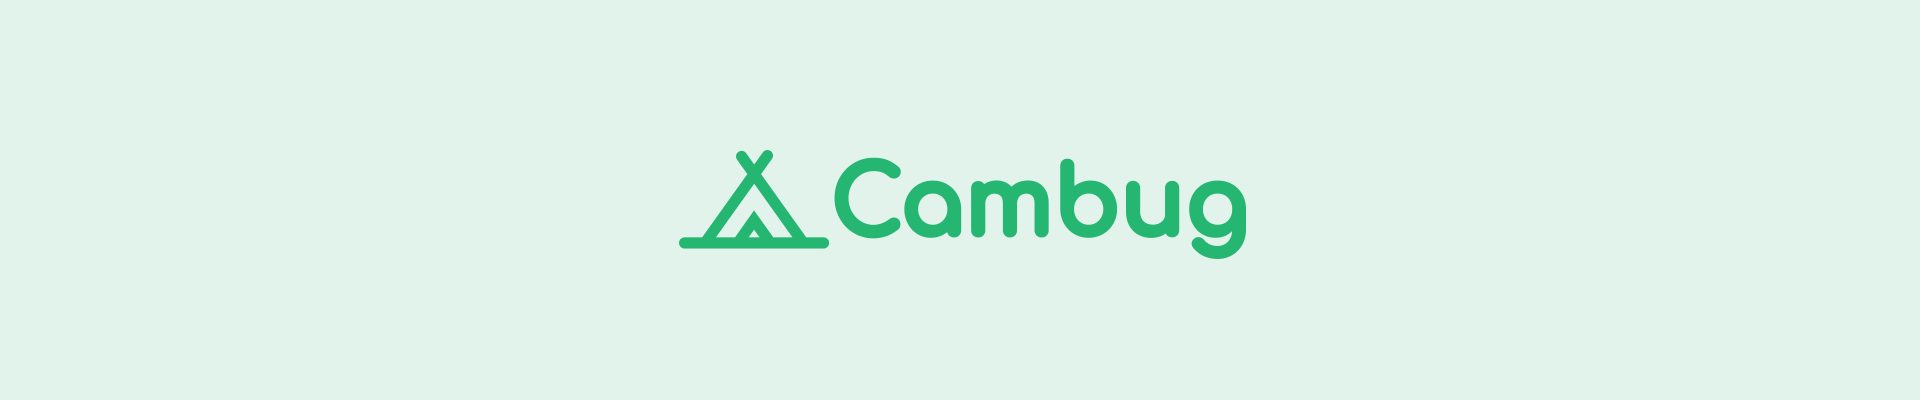 cambug-top-1920x400.png